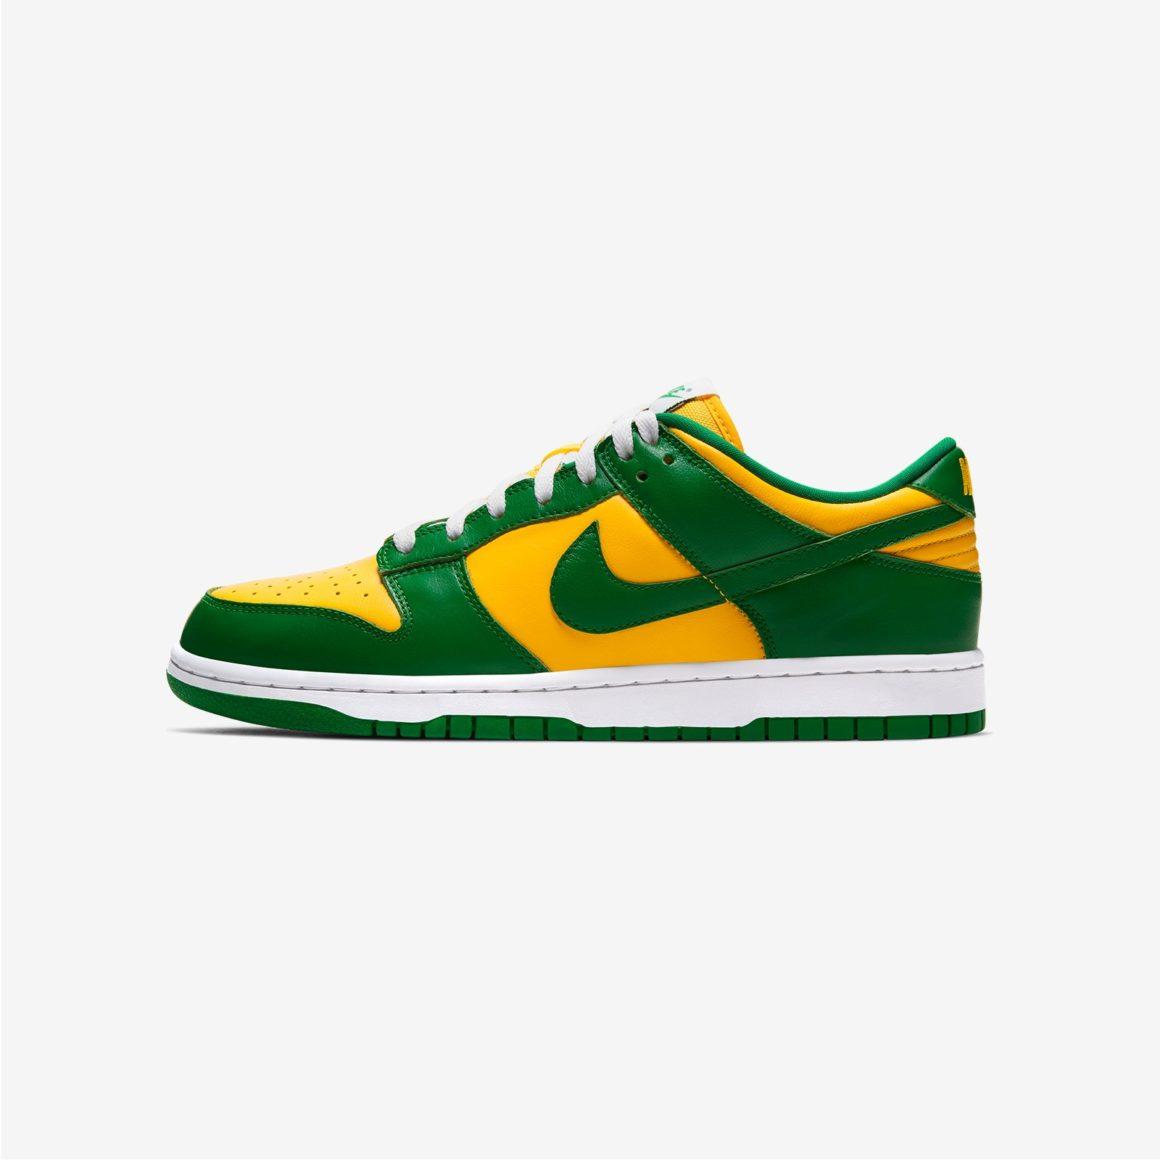 Nike-Dunk-Low-SP-Brazil-Varsity-Maize-Pine-Green-White-CU1727-700